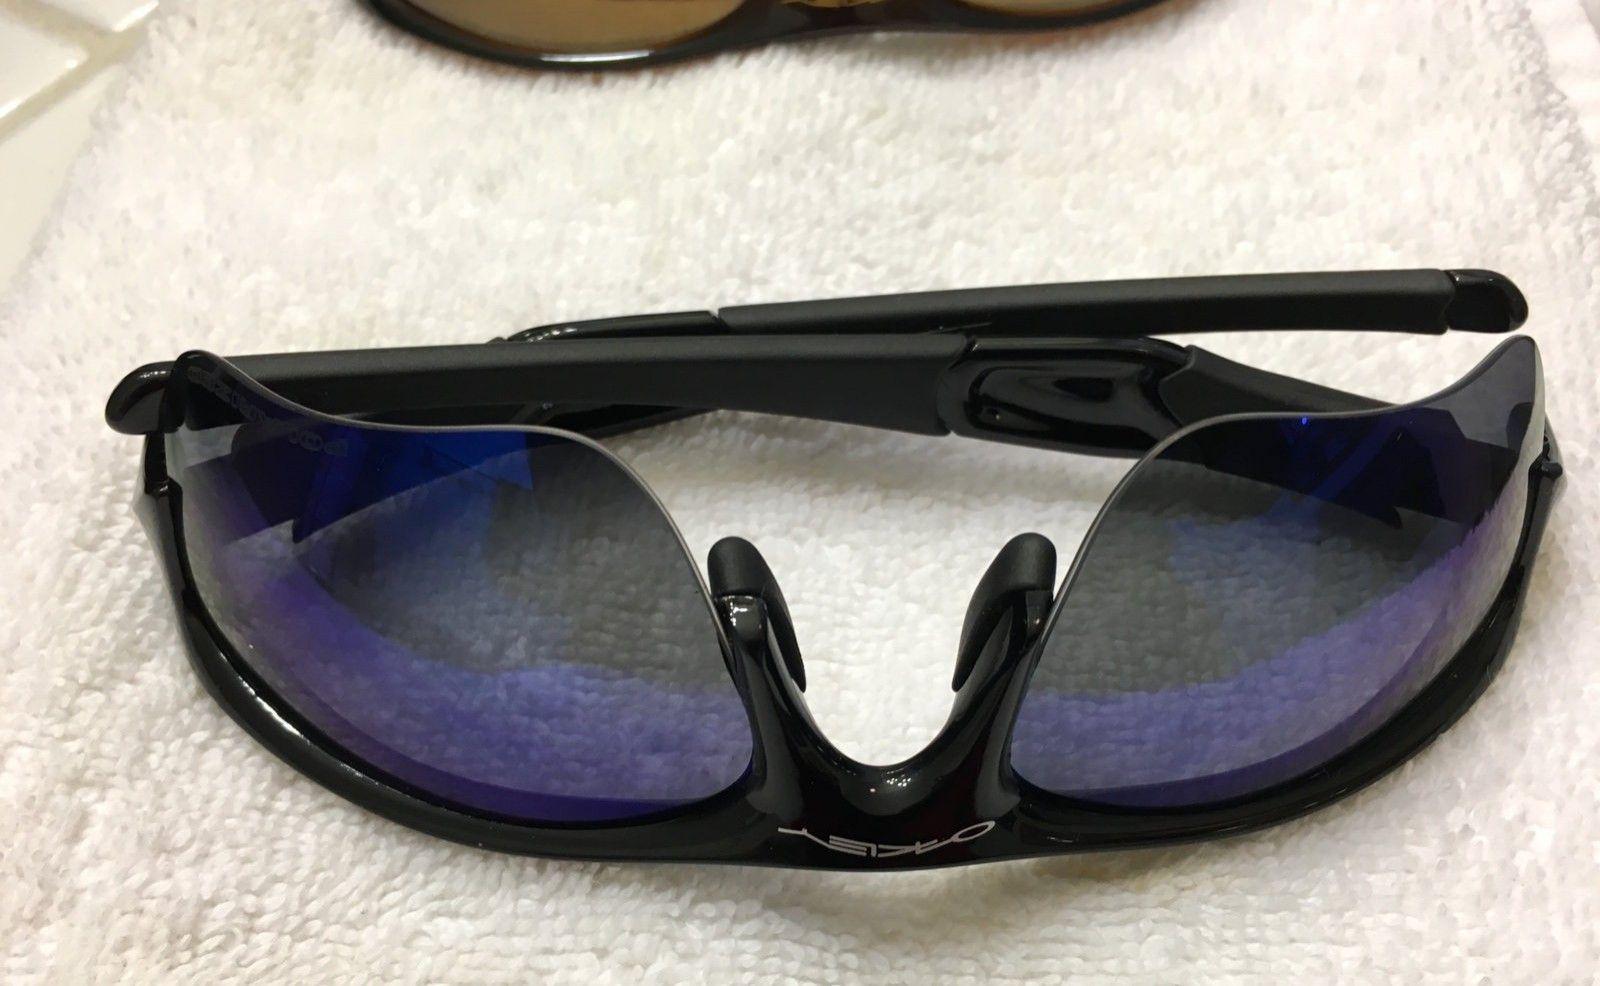 Flak Jacket 1.0 - 2 pairs - Polarized lenses - 2016-07-07 19.22.57.jpg